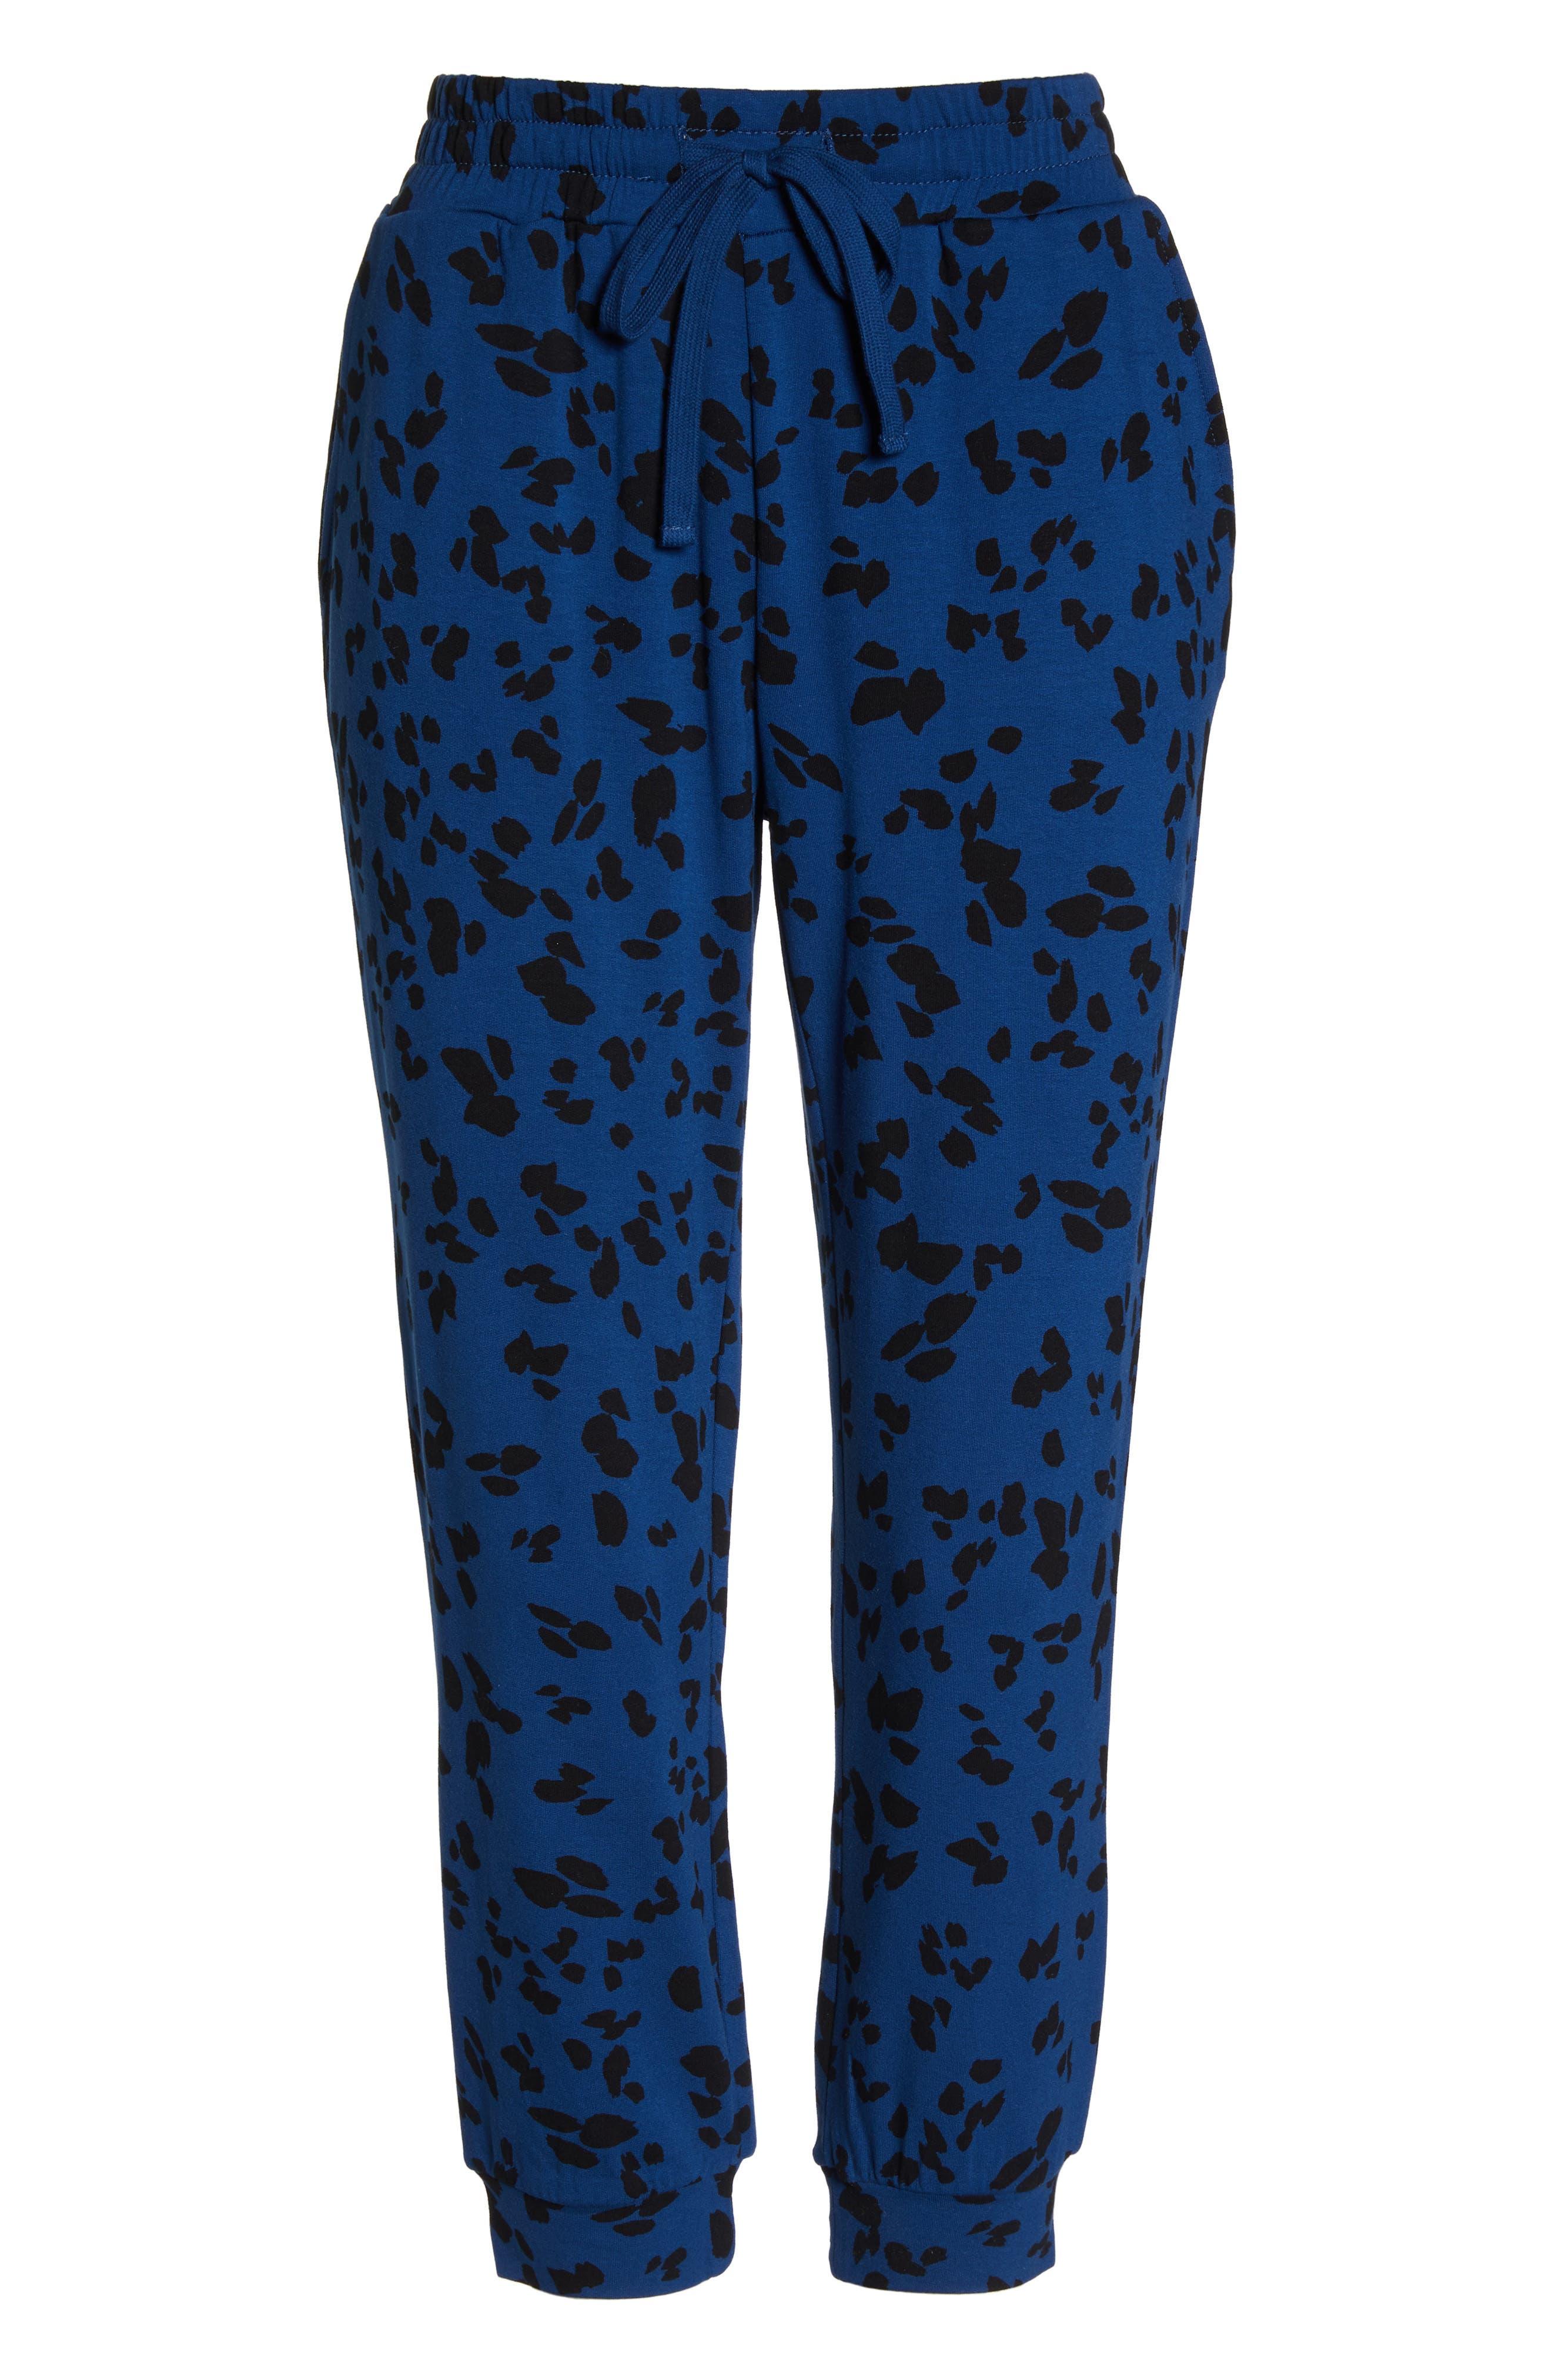 Totally Trending Leopard Print Jogger Pants,                             Alternate thumbnail 6, color,                             MARINE